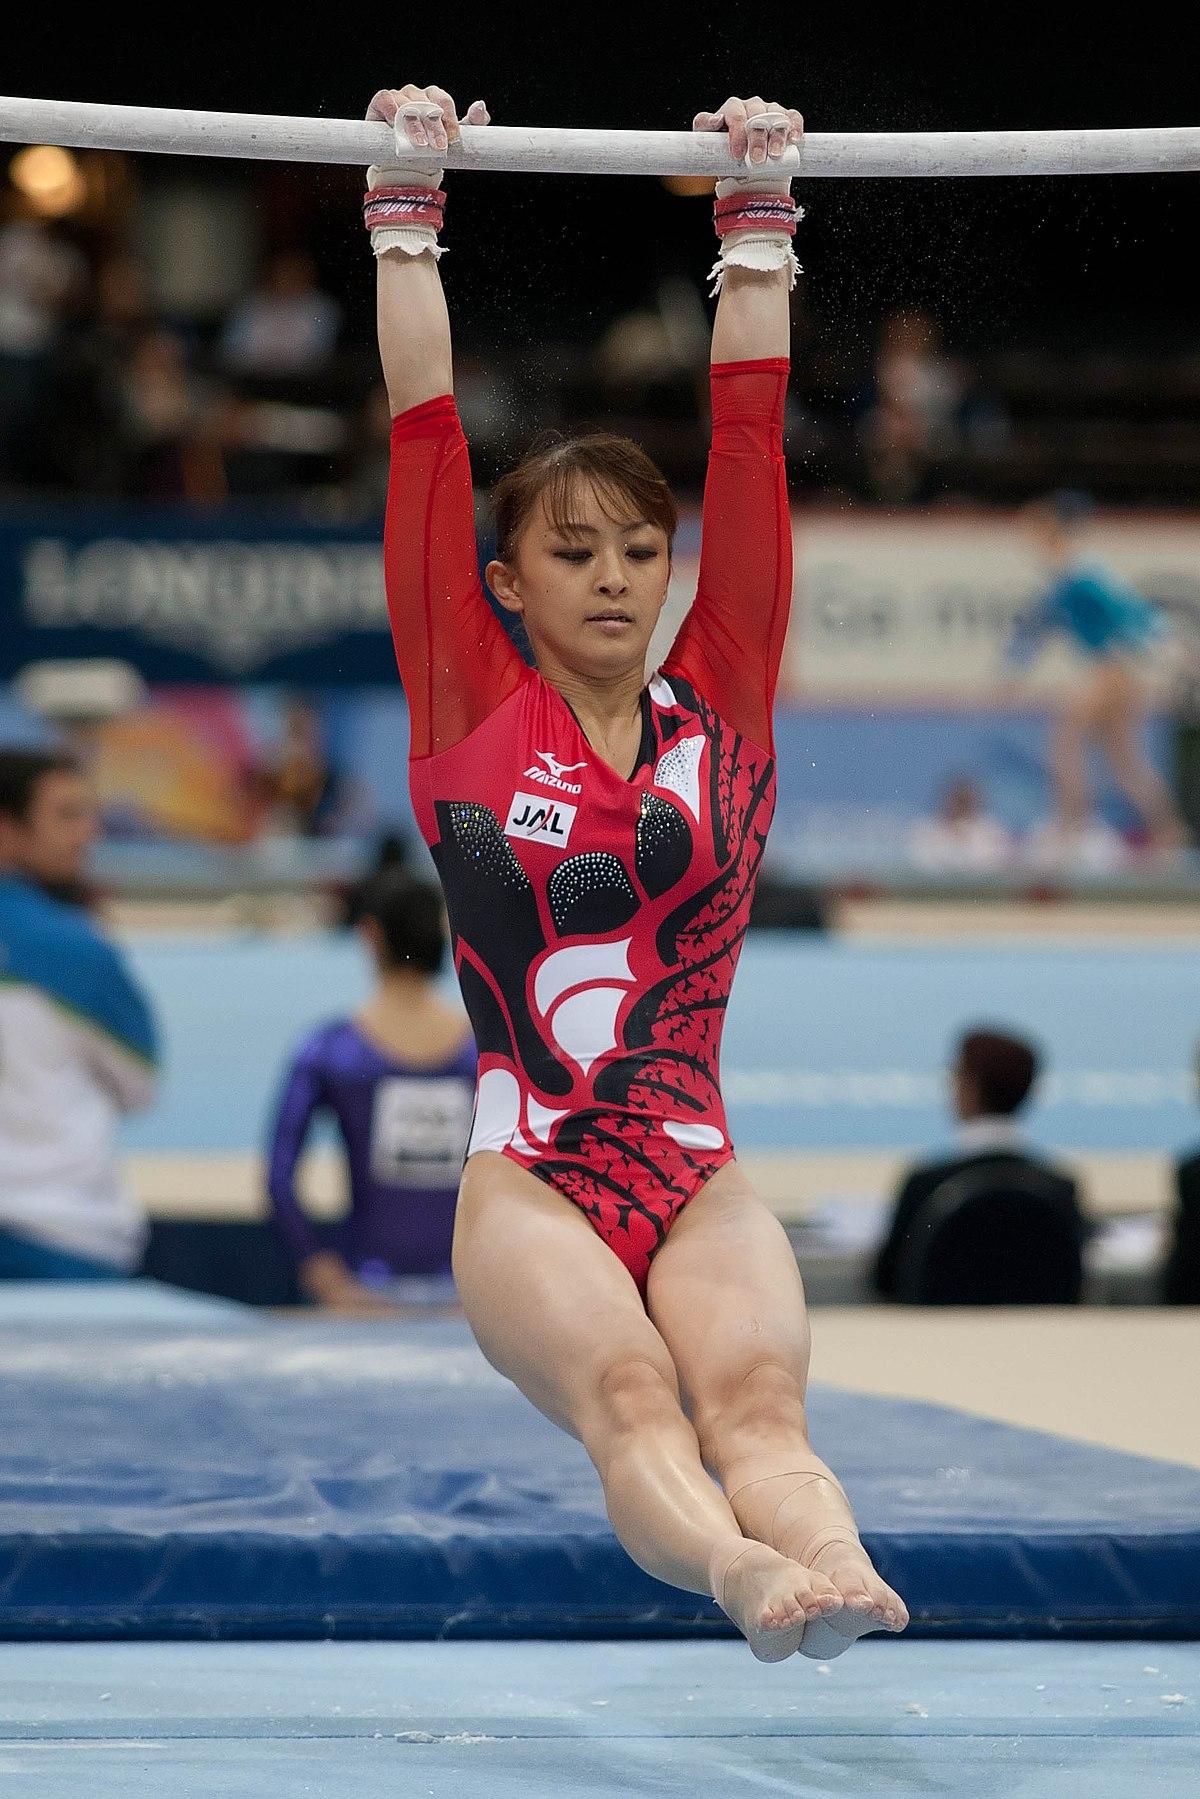 田中理恵 (体操選手)の画像 p1_21